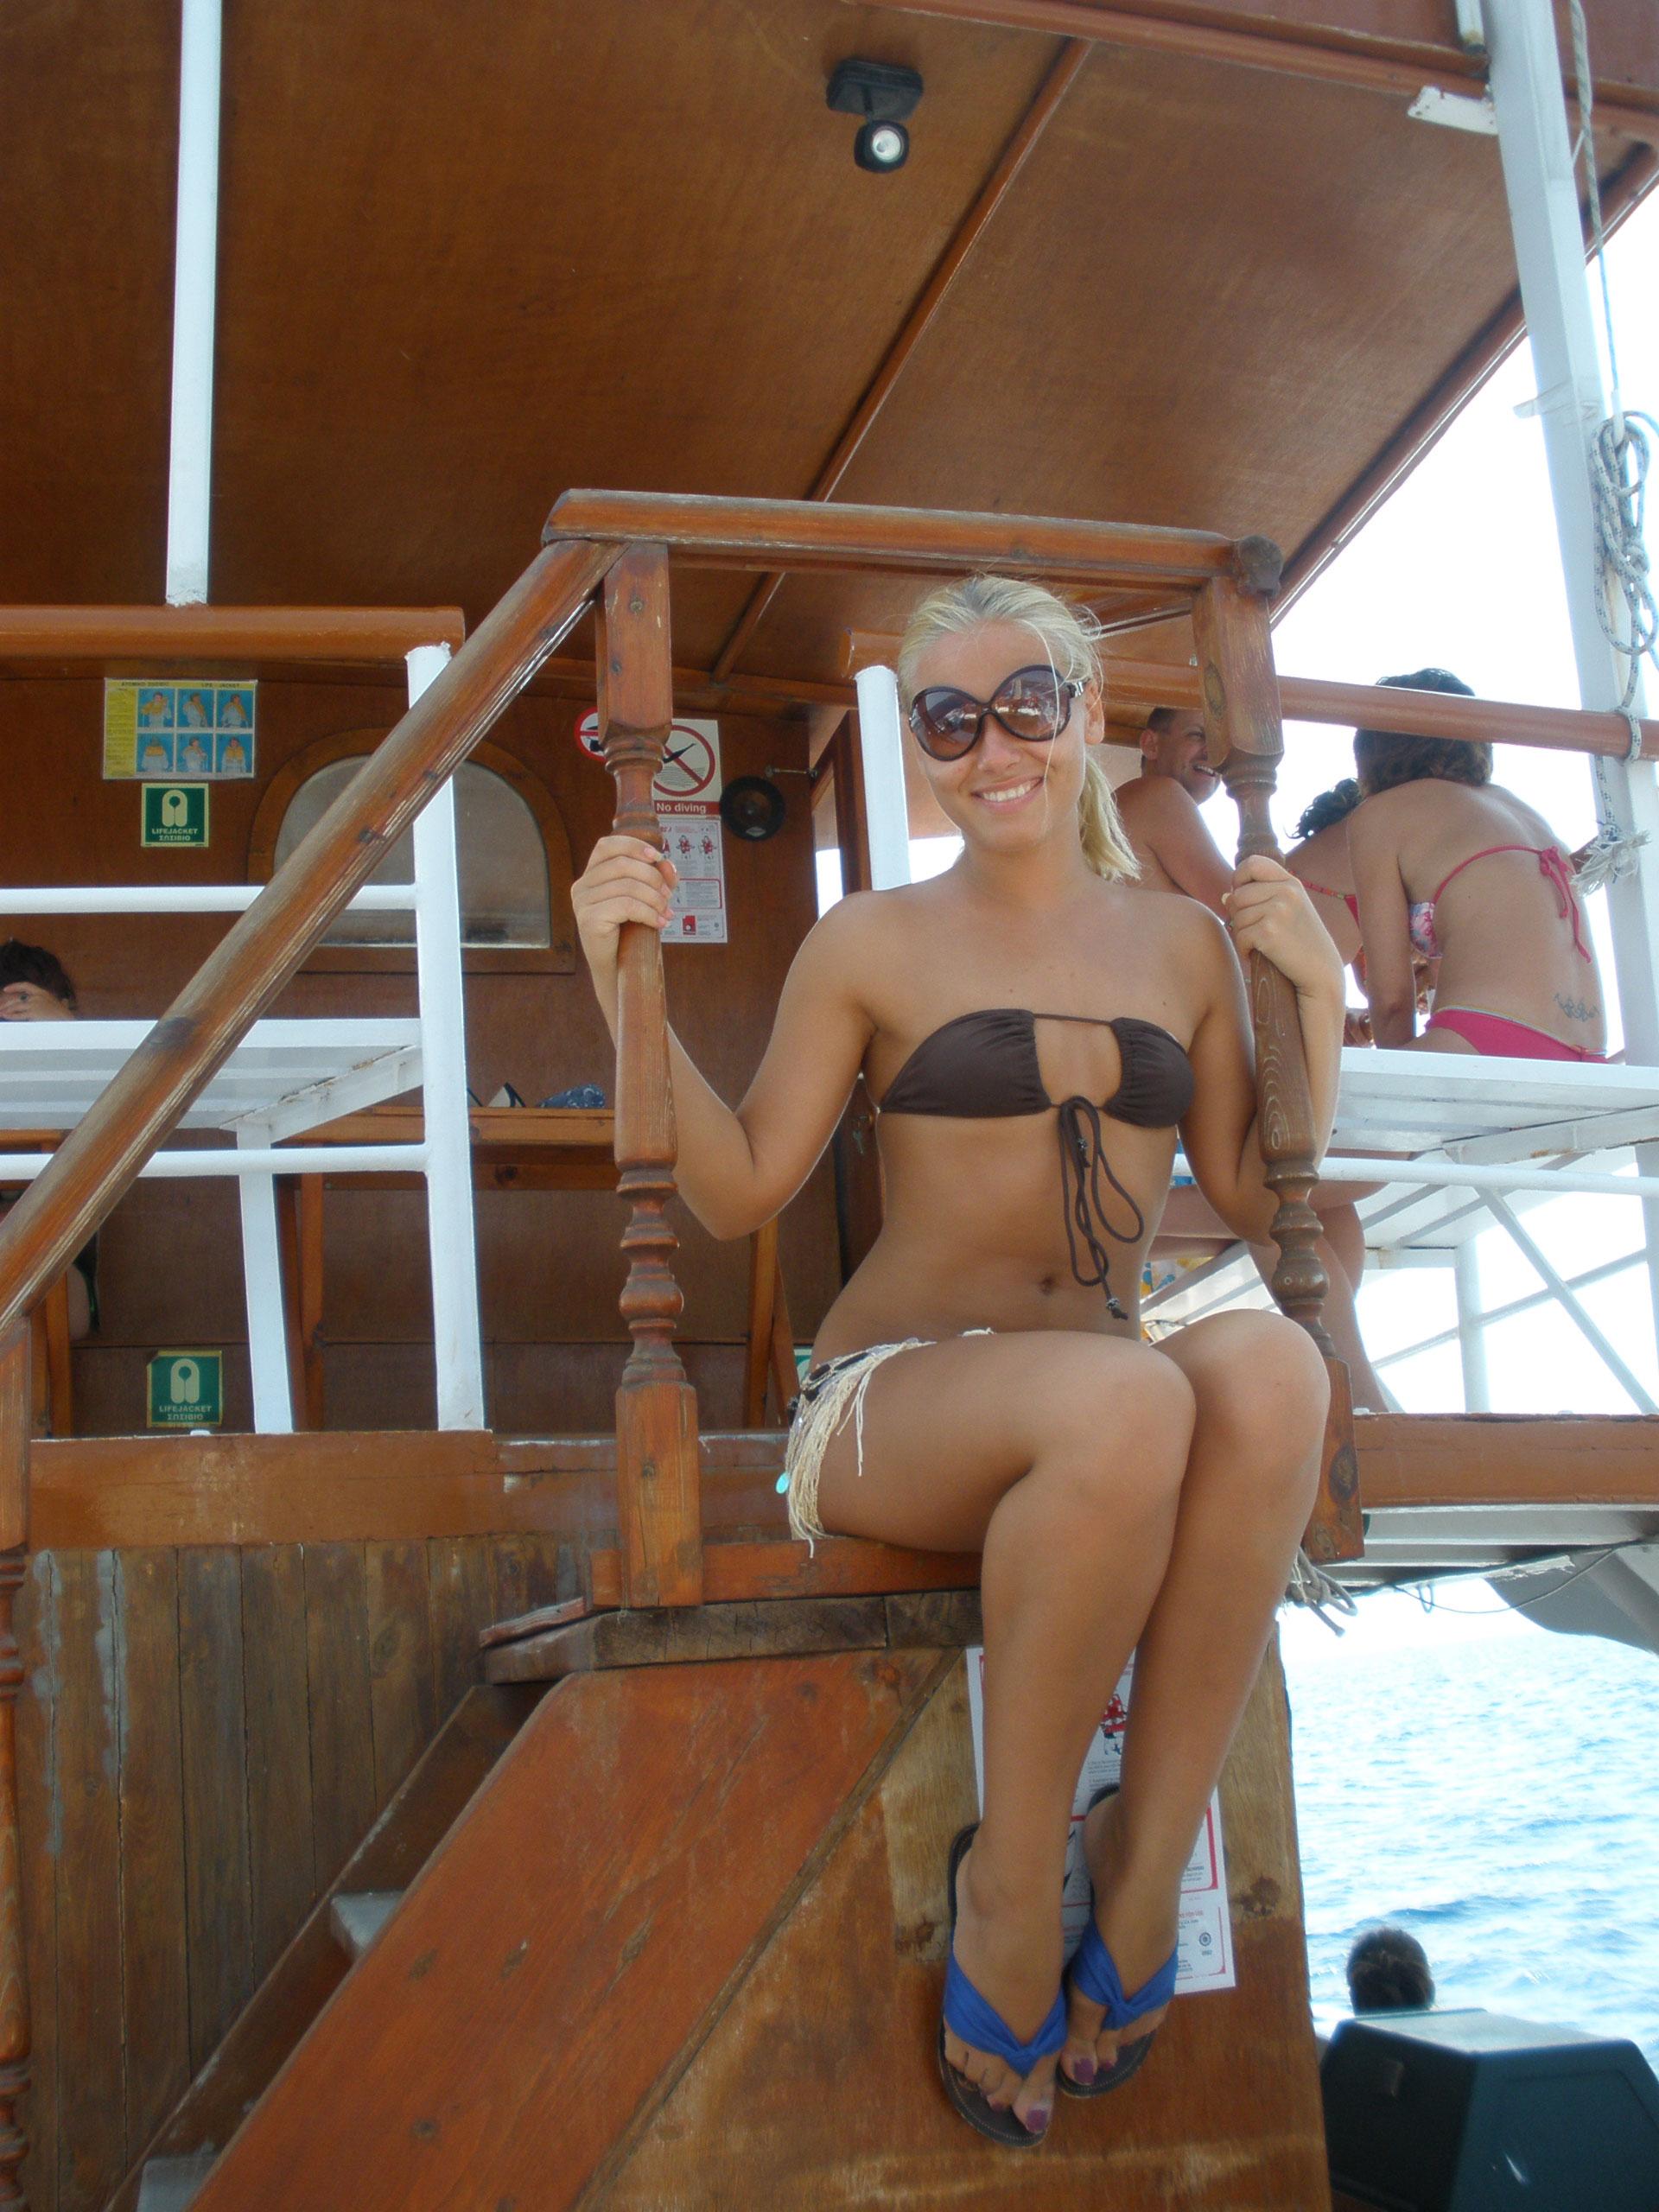 Bikini Legs Irina Ioana Baiant  nudes (88 pictures), 2019, cameltoe